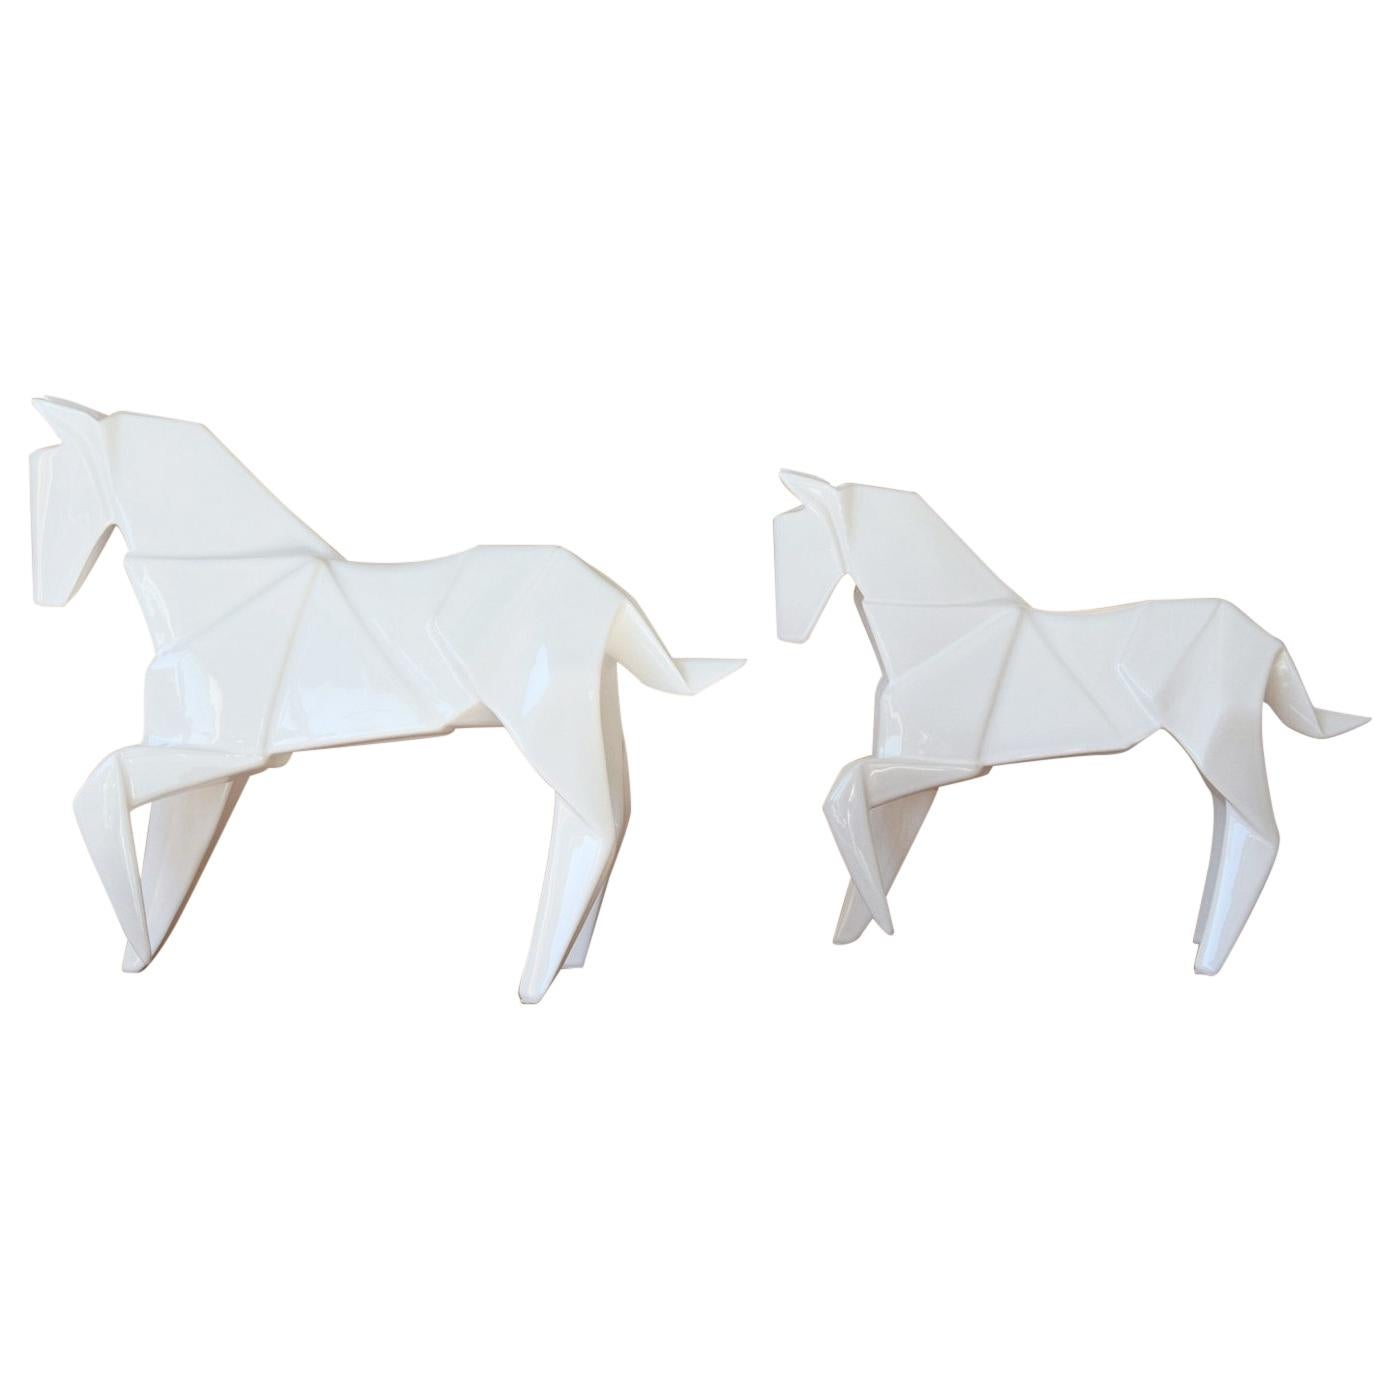 Stallion White Set of 2 Sculpture